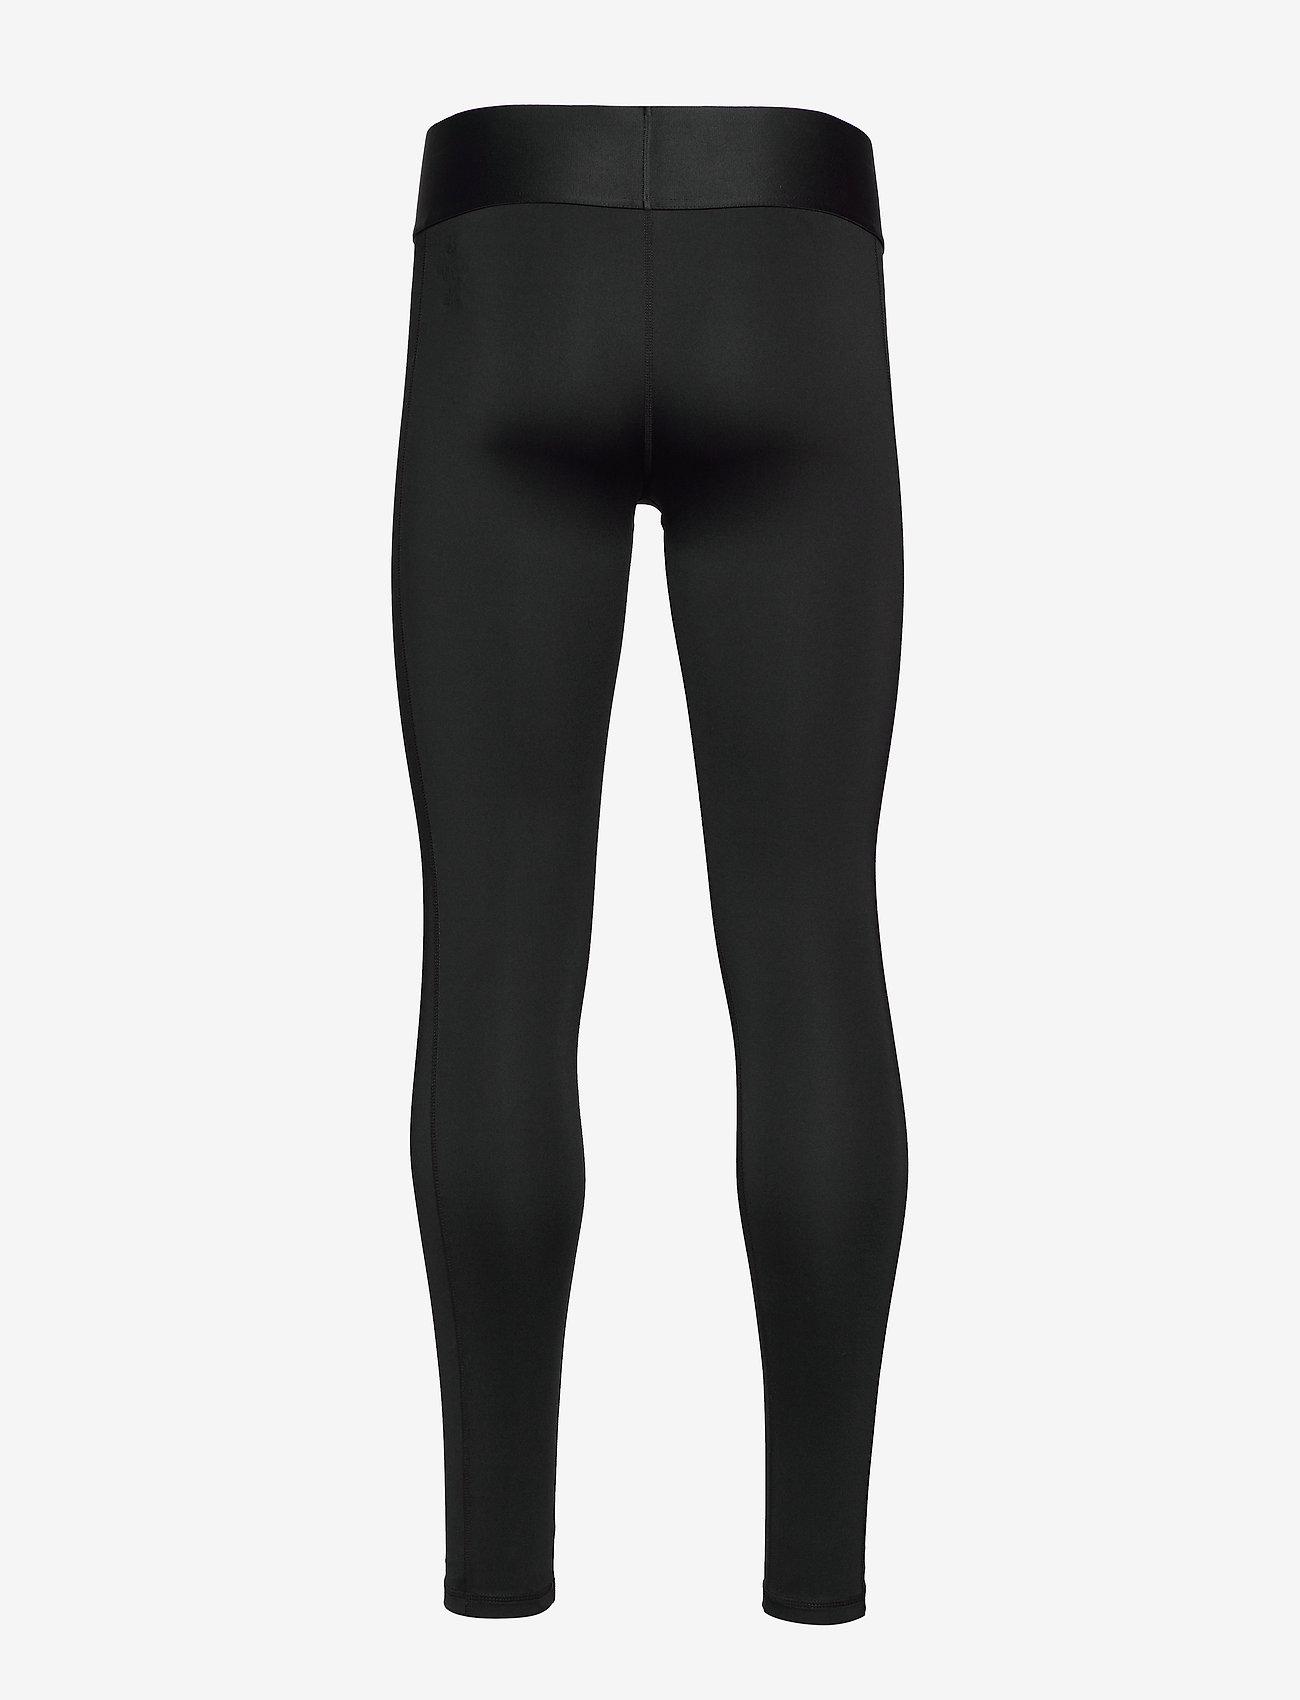 Calvin Klein Performance - FULL LENGTH TIGHT - running & training tights - ck black/bright white - 1